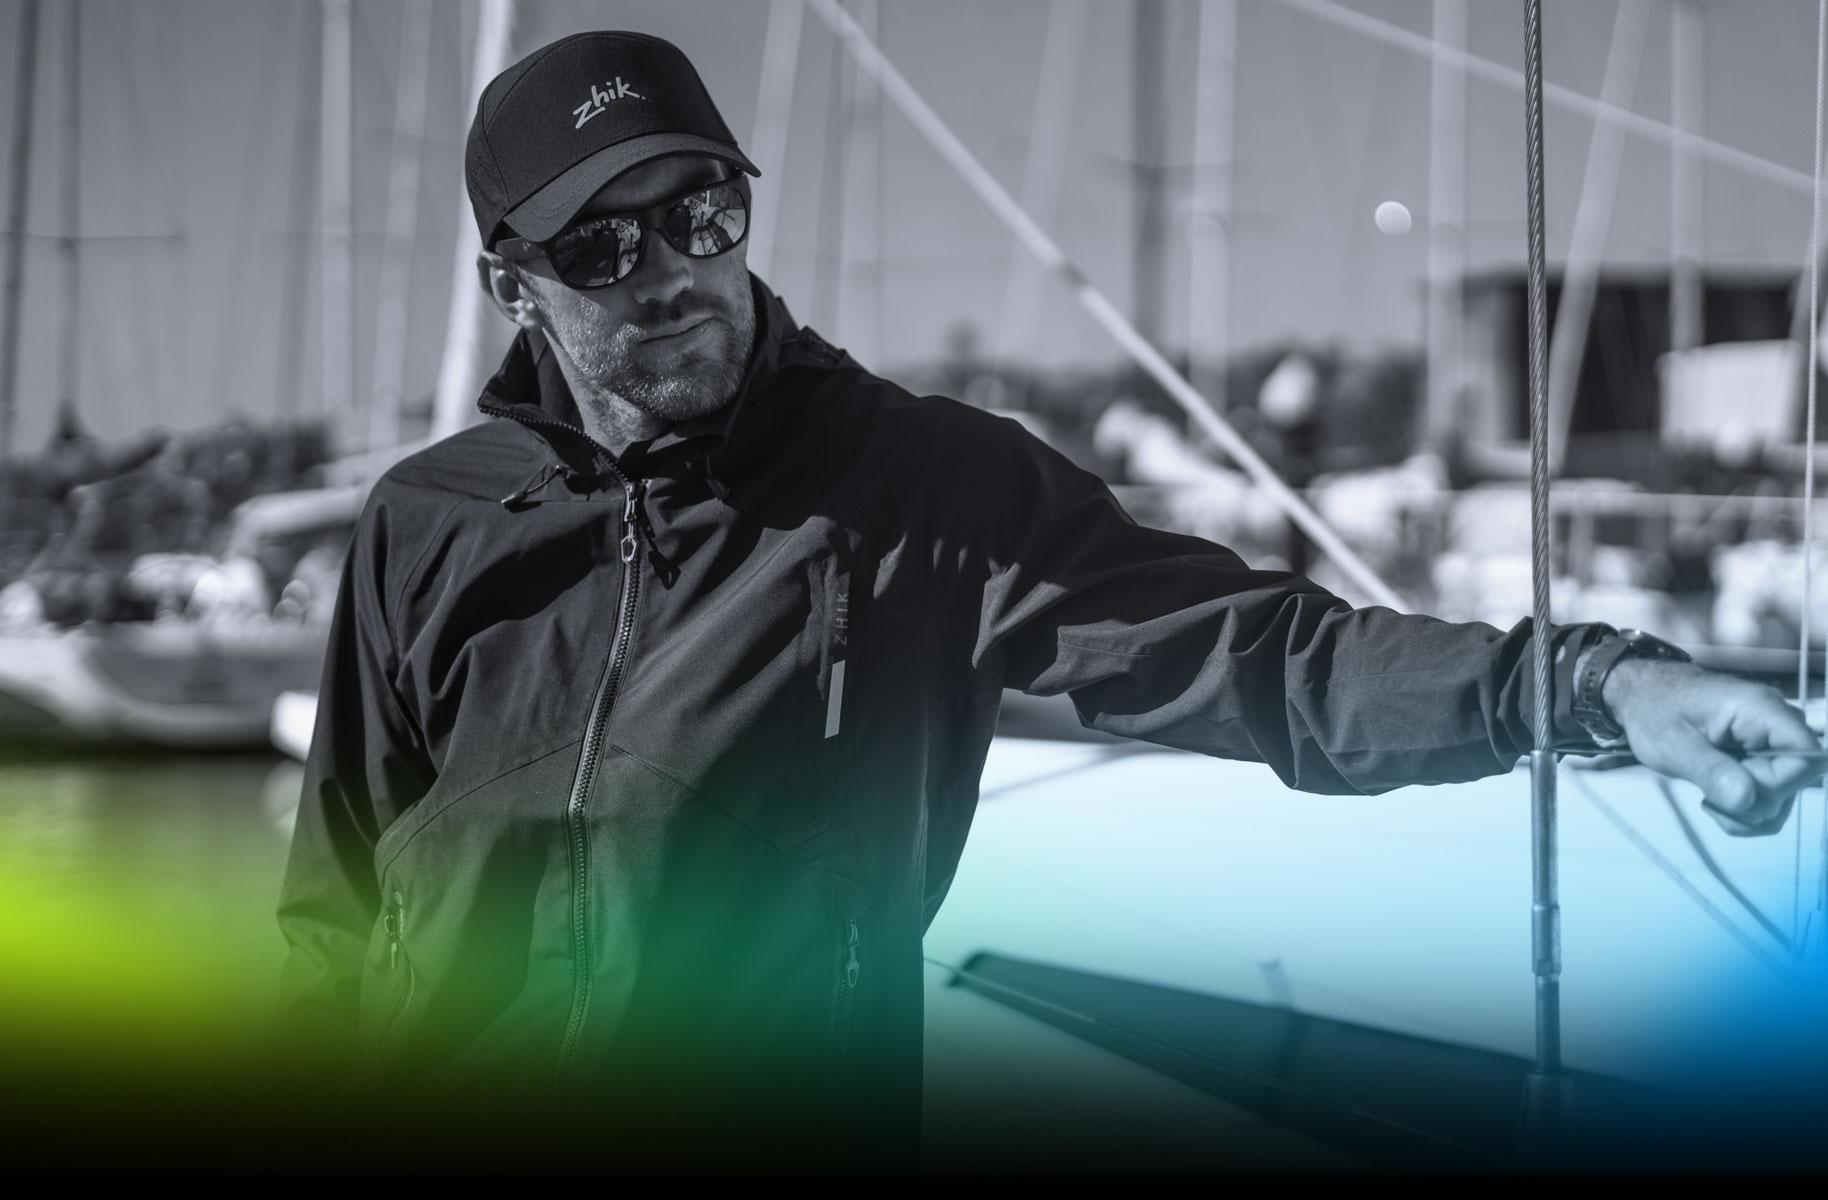 ZHIK's new INS200 jacket redefines inshore gear